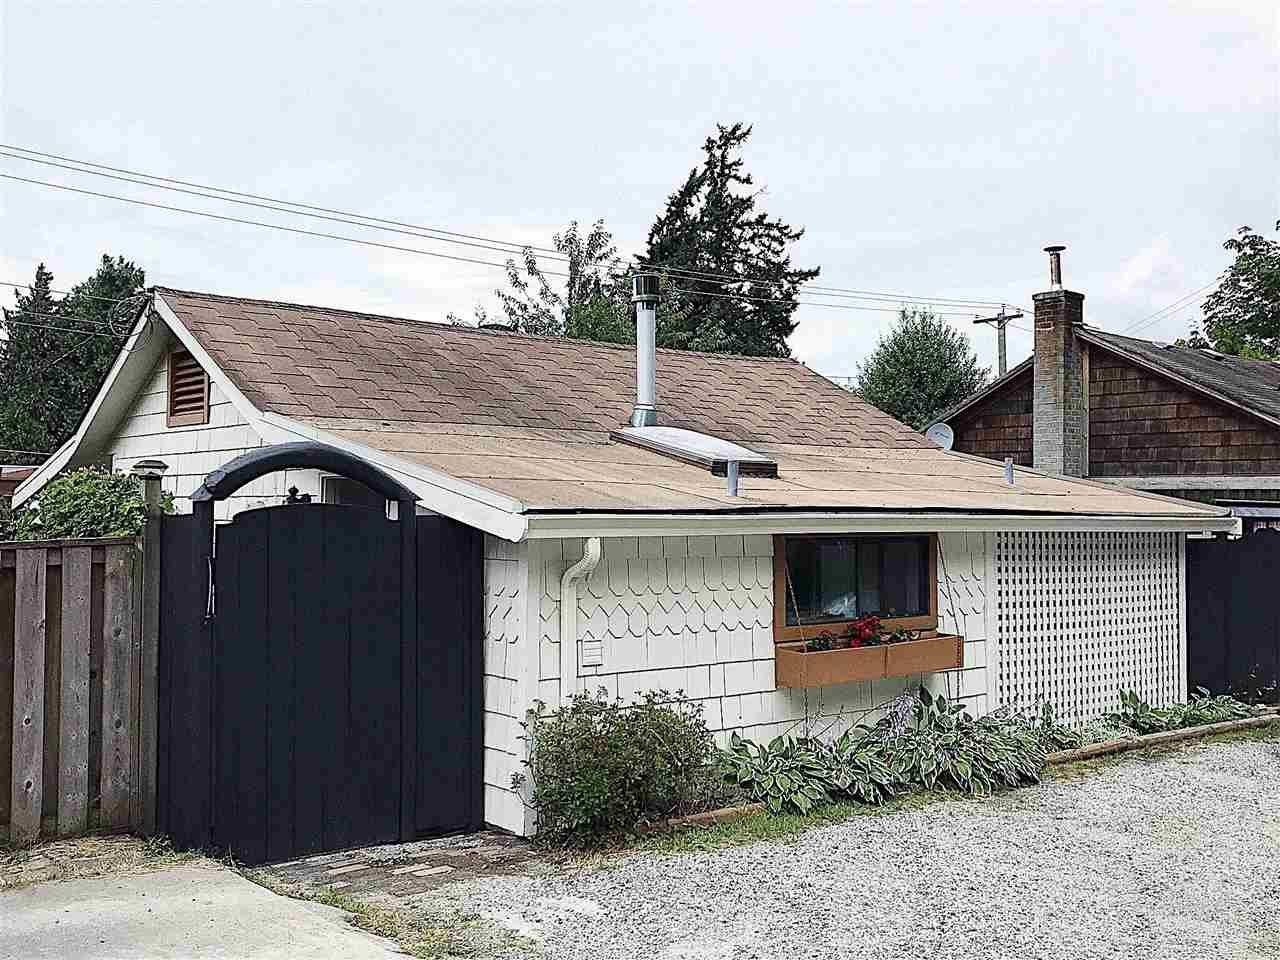 Main Photo: 5285 LITTLE Lane in Sechelt: Sechelt District House for sale (Sunshine Coast)  : MLS®# R2592580